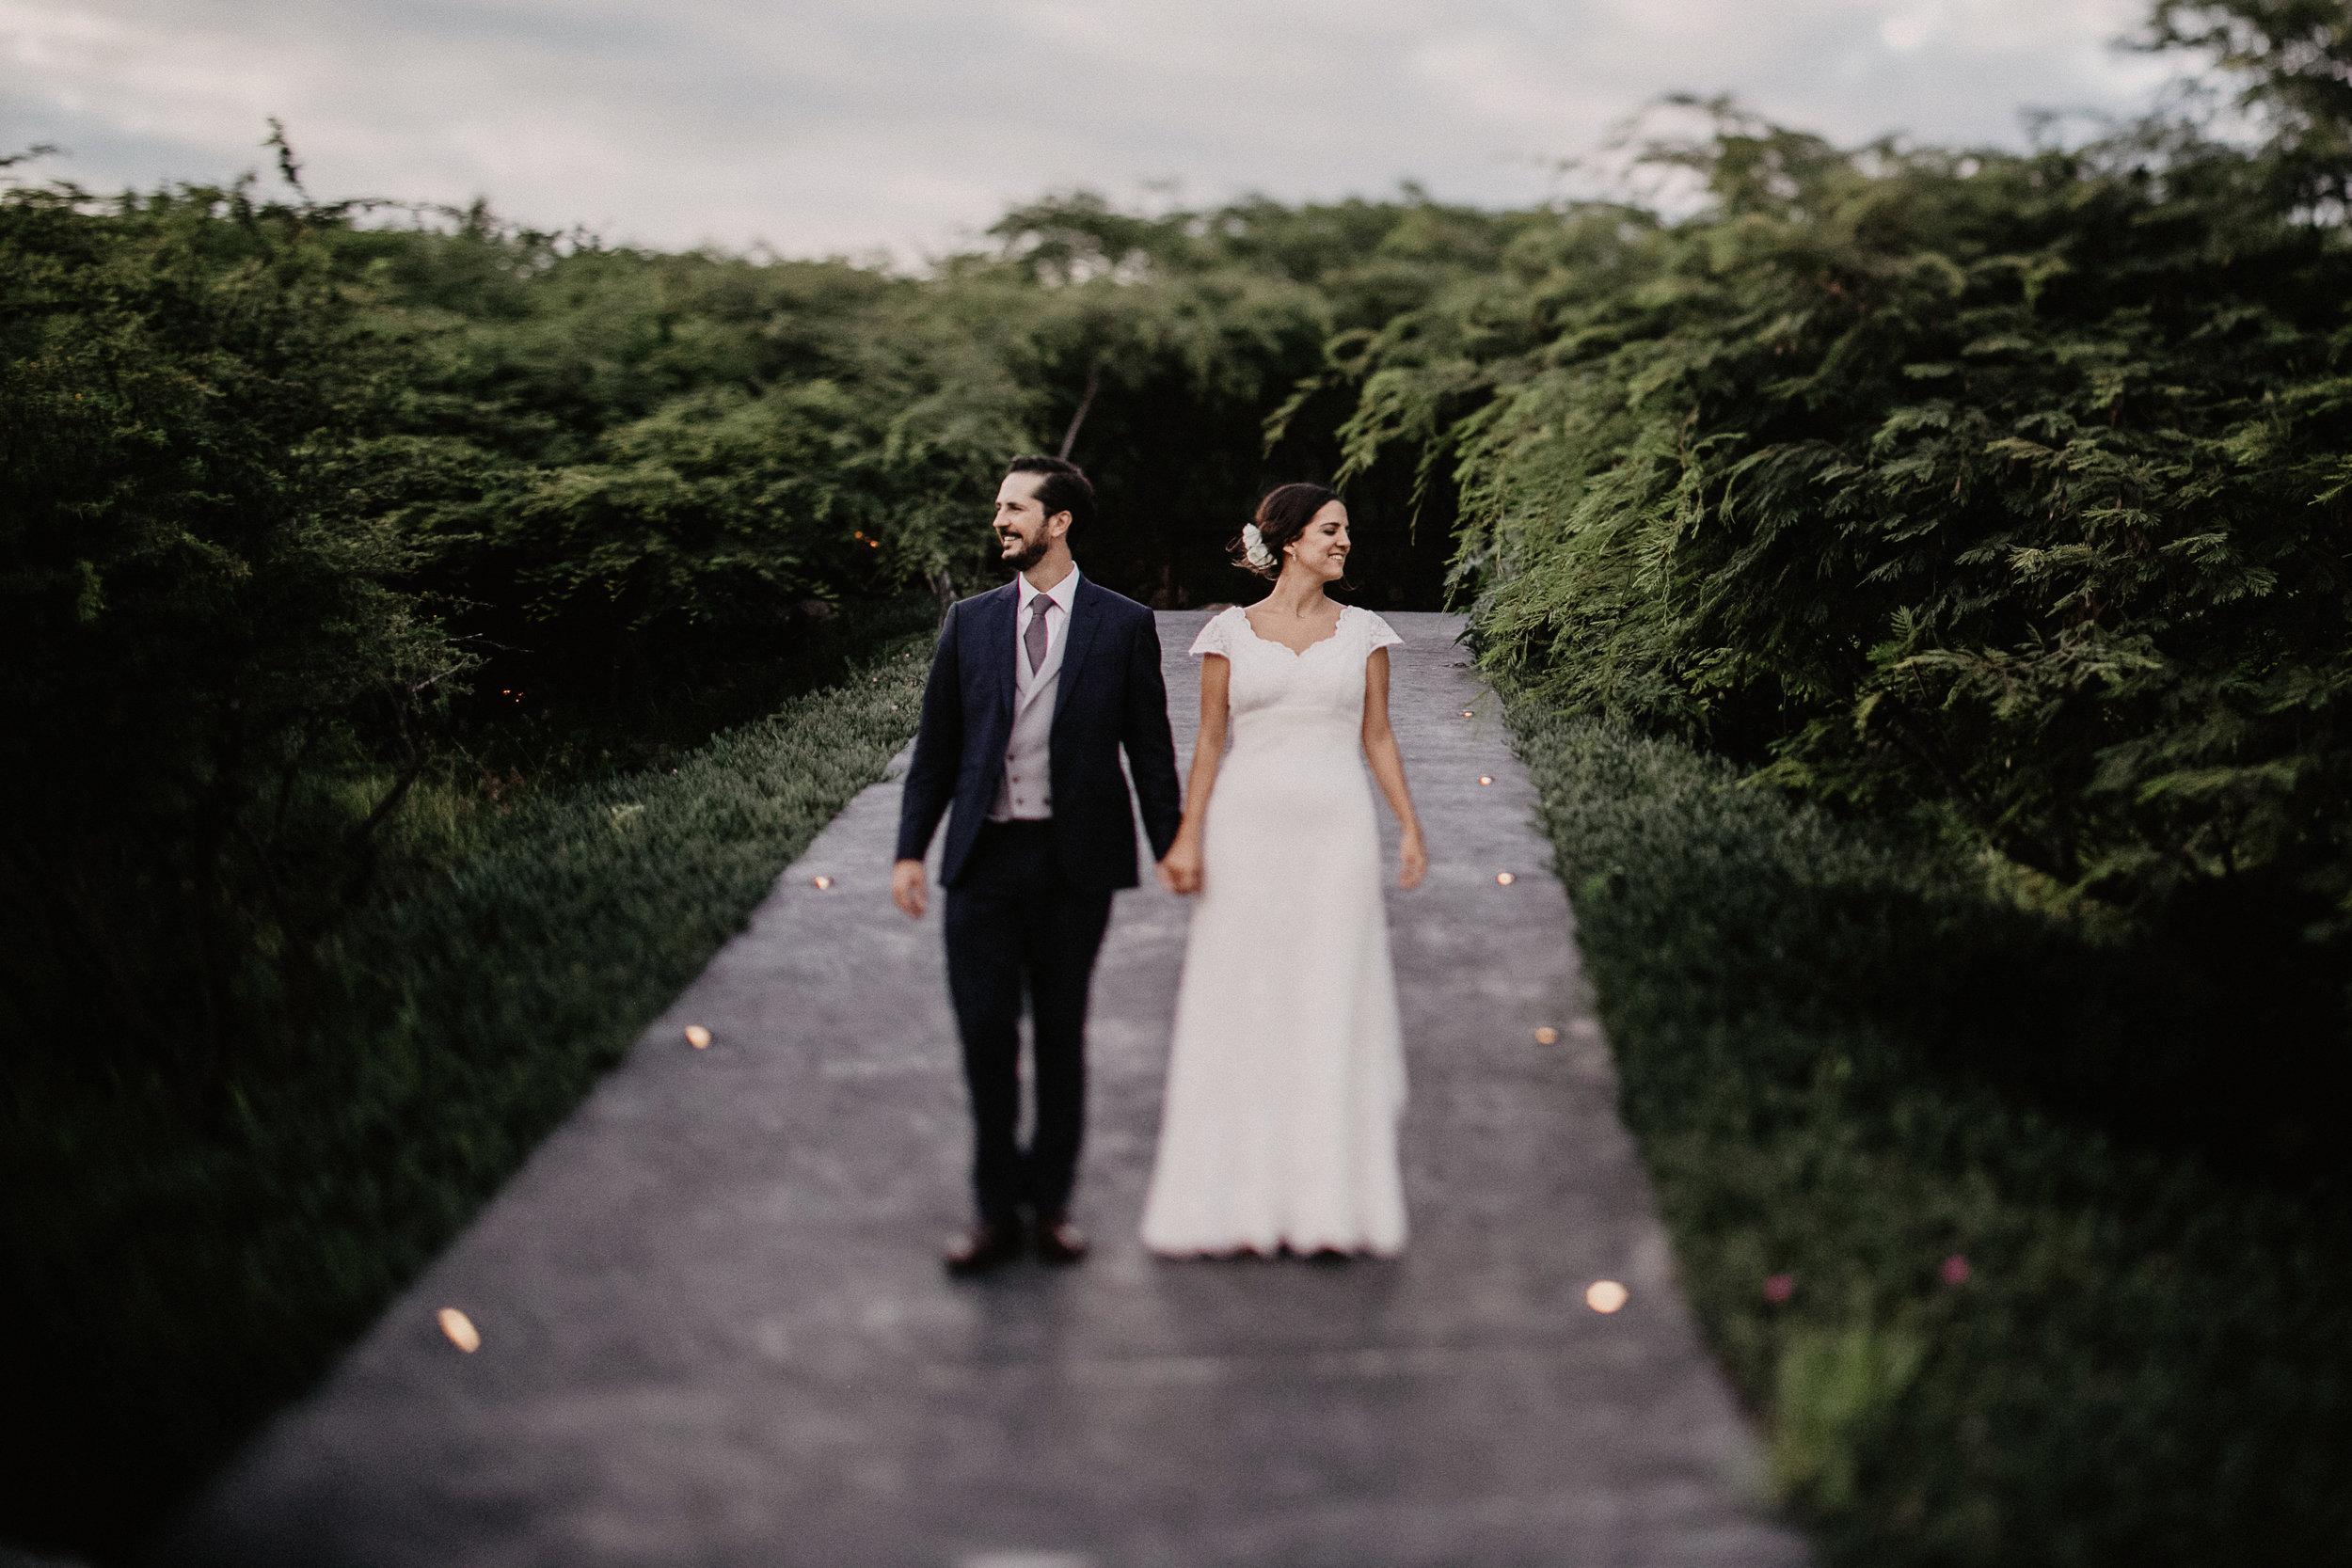 alfonso_flores_destination_wedding_photographer_pau_alonso_1028.JPG